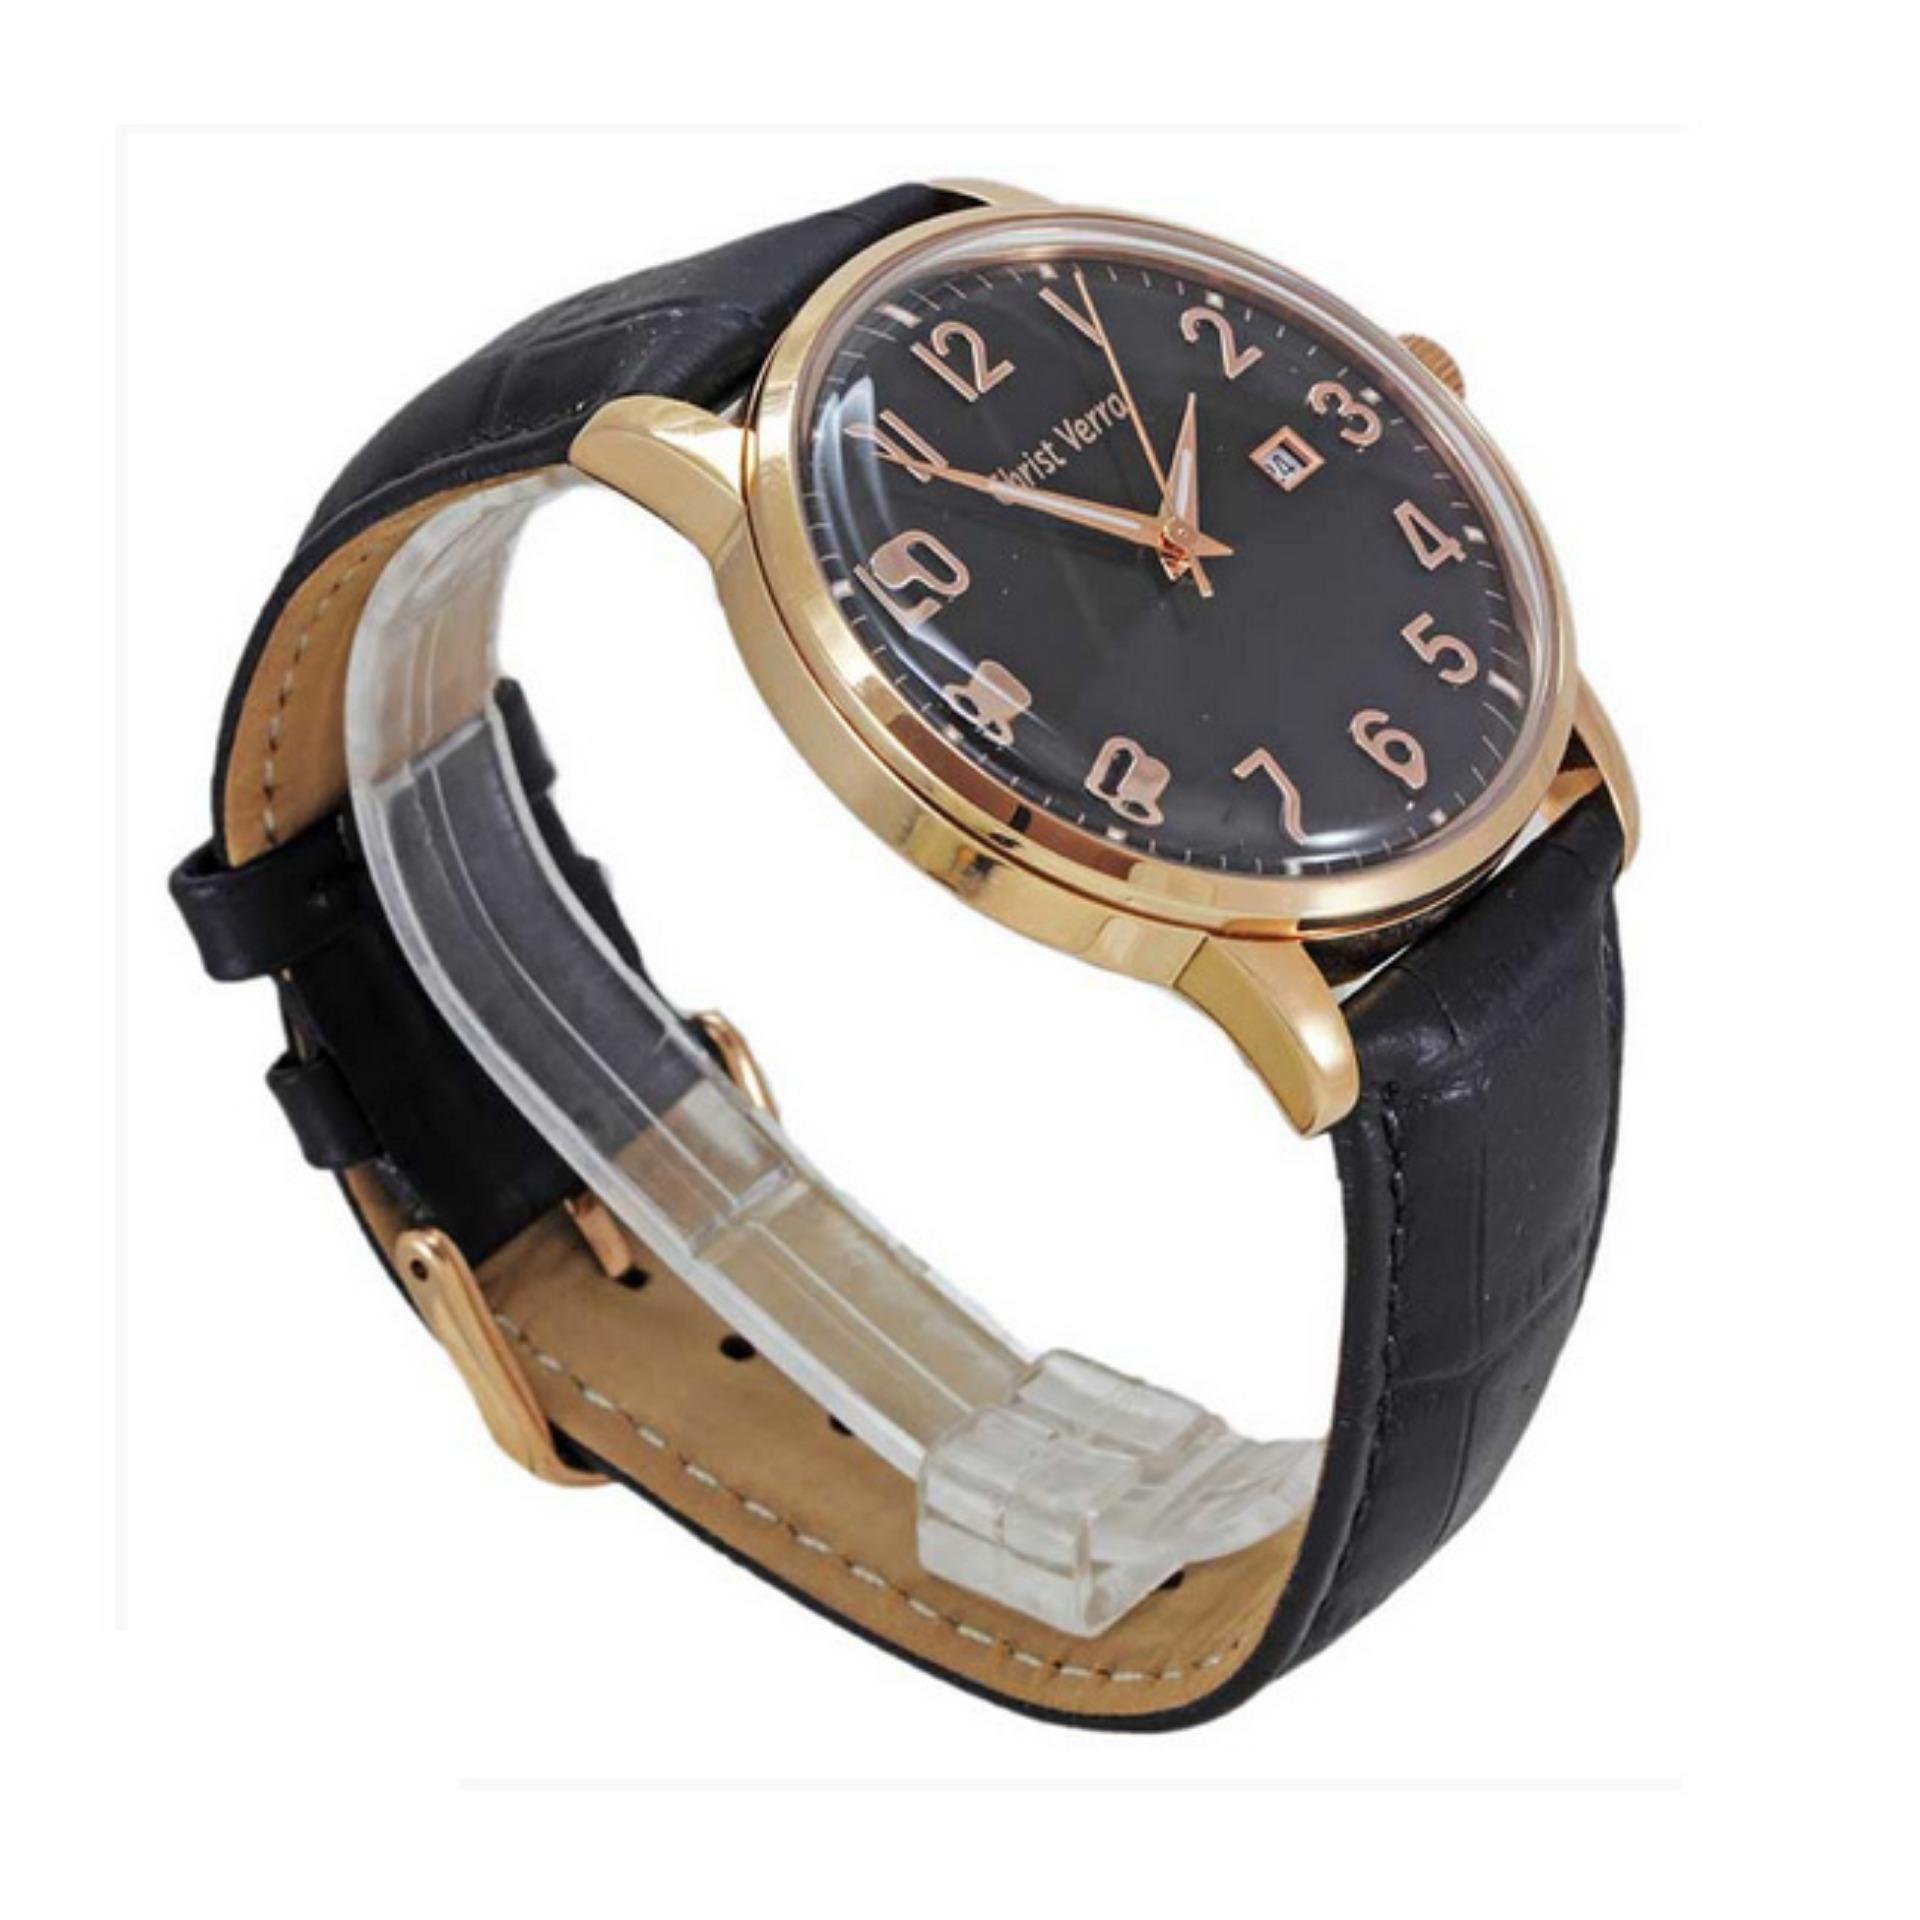 Christ Verra Jam Tangan Pria Hitam Leather Strap 06199g 28 Update 72025g 13 Silver Gold Klasik Tali Kulit Original